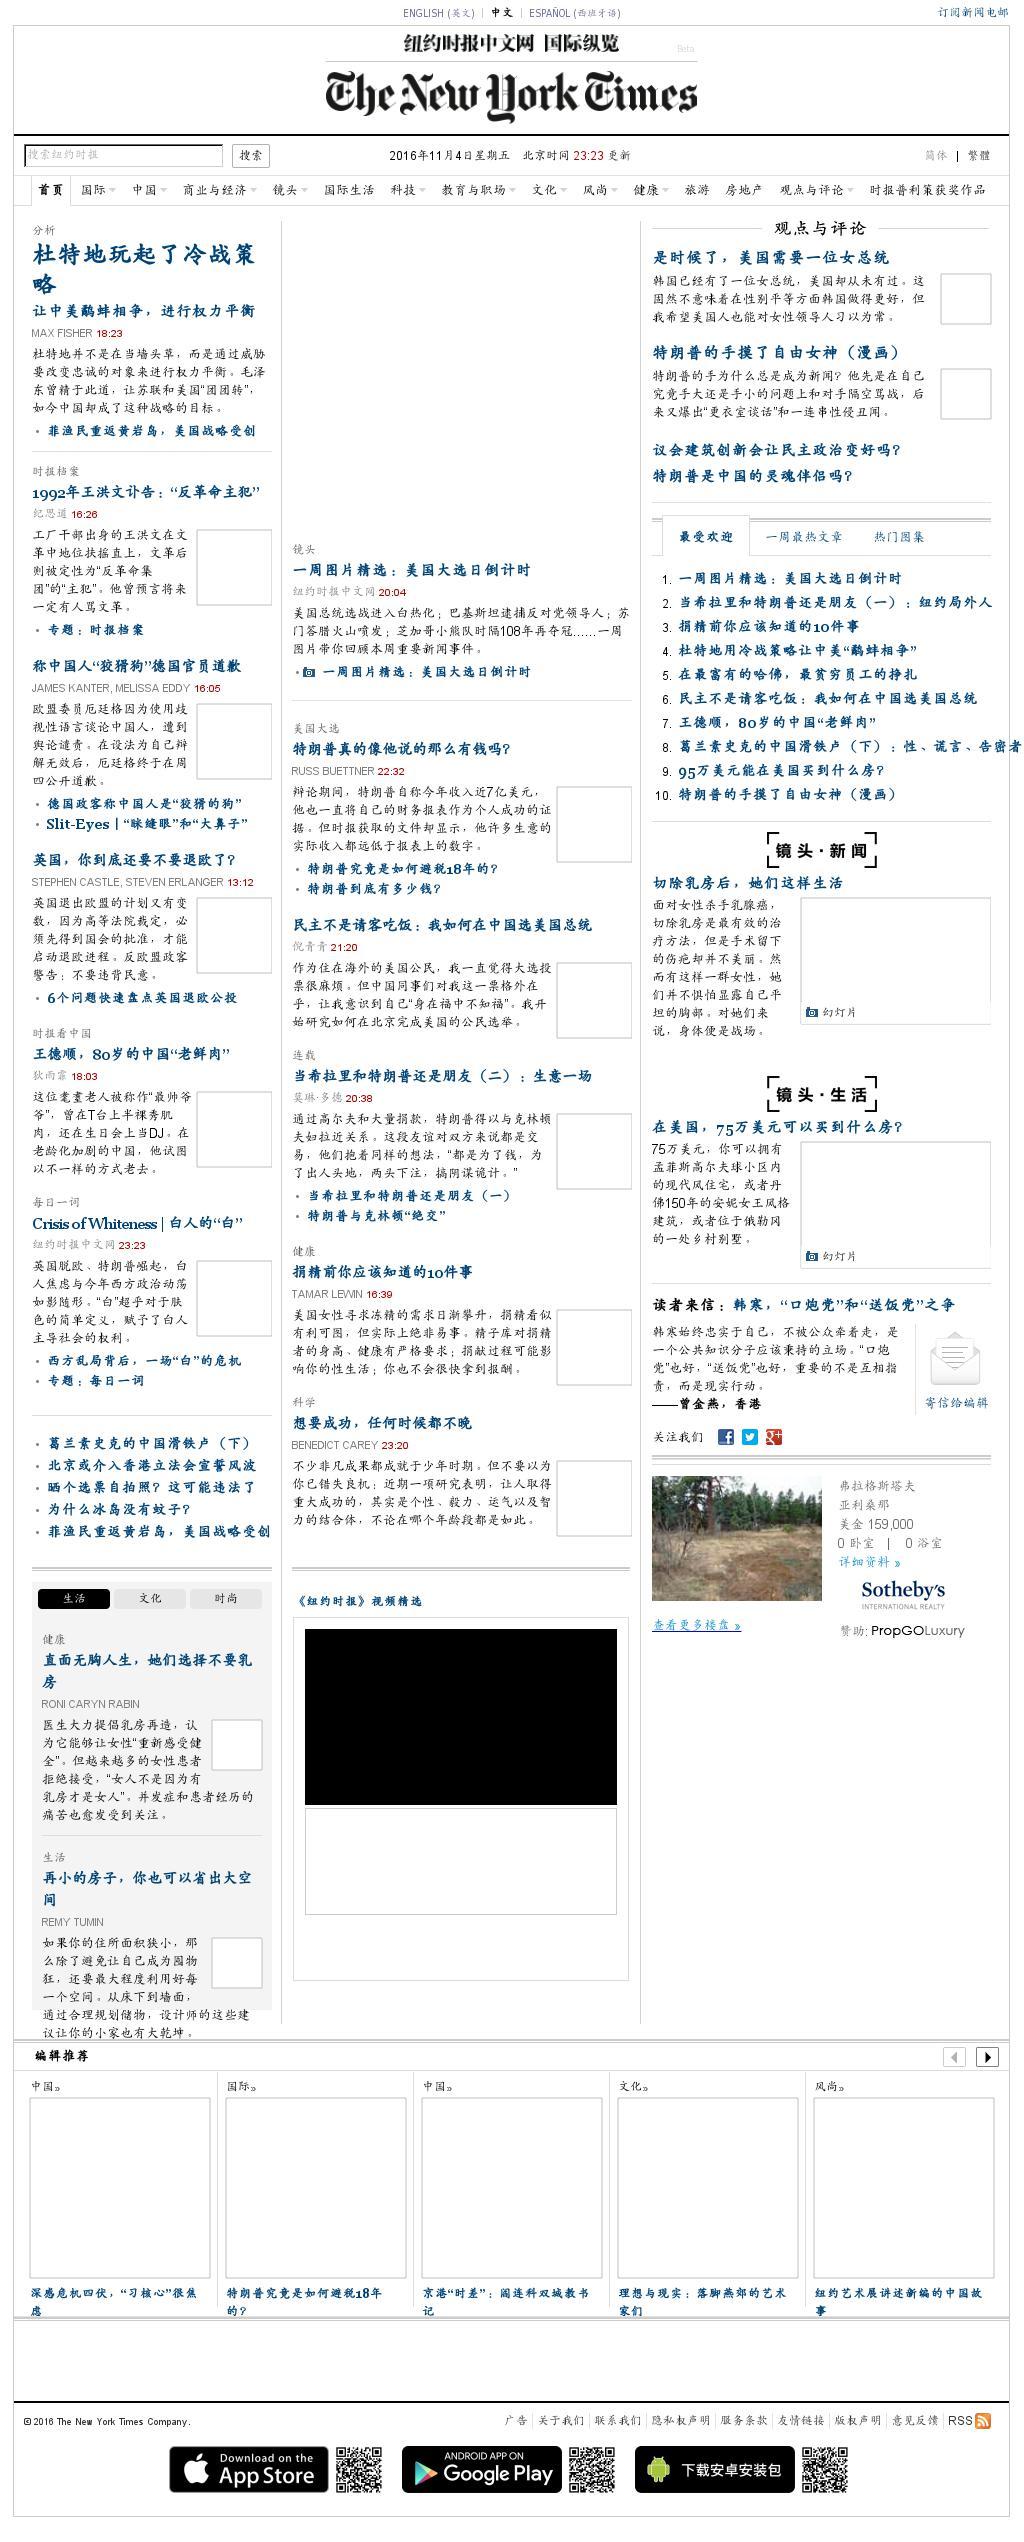 The New York Times (Chinese) at Saturday Nov. 5, 2016, 10:12 a.m. UTC